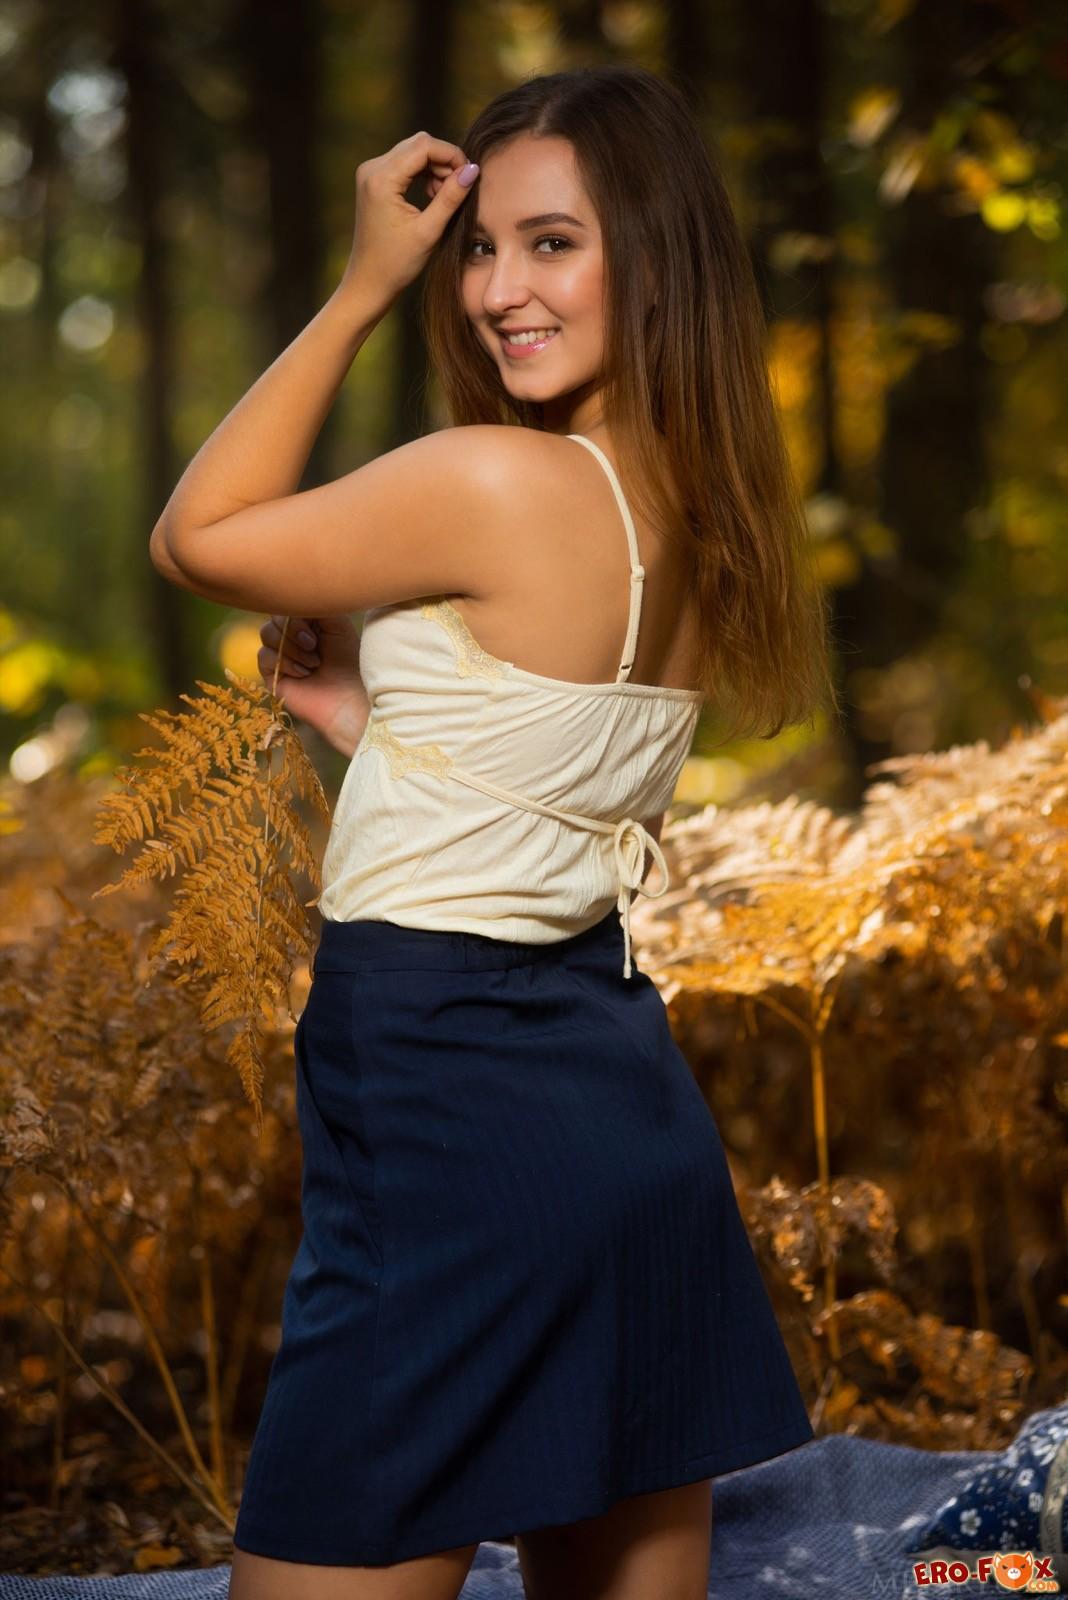 Шатенка с классной жопой сняла юбку на природе - фото